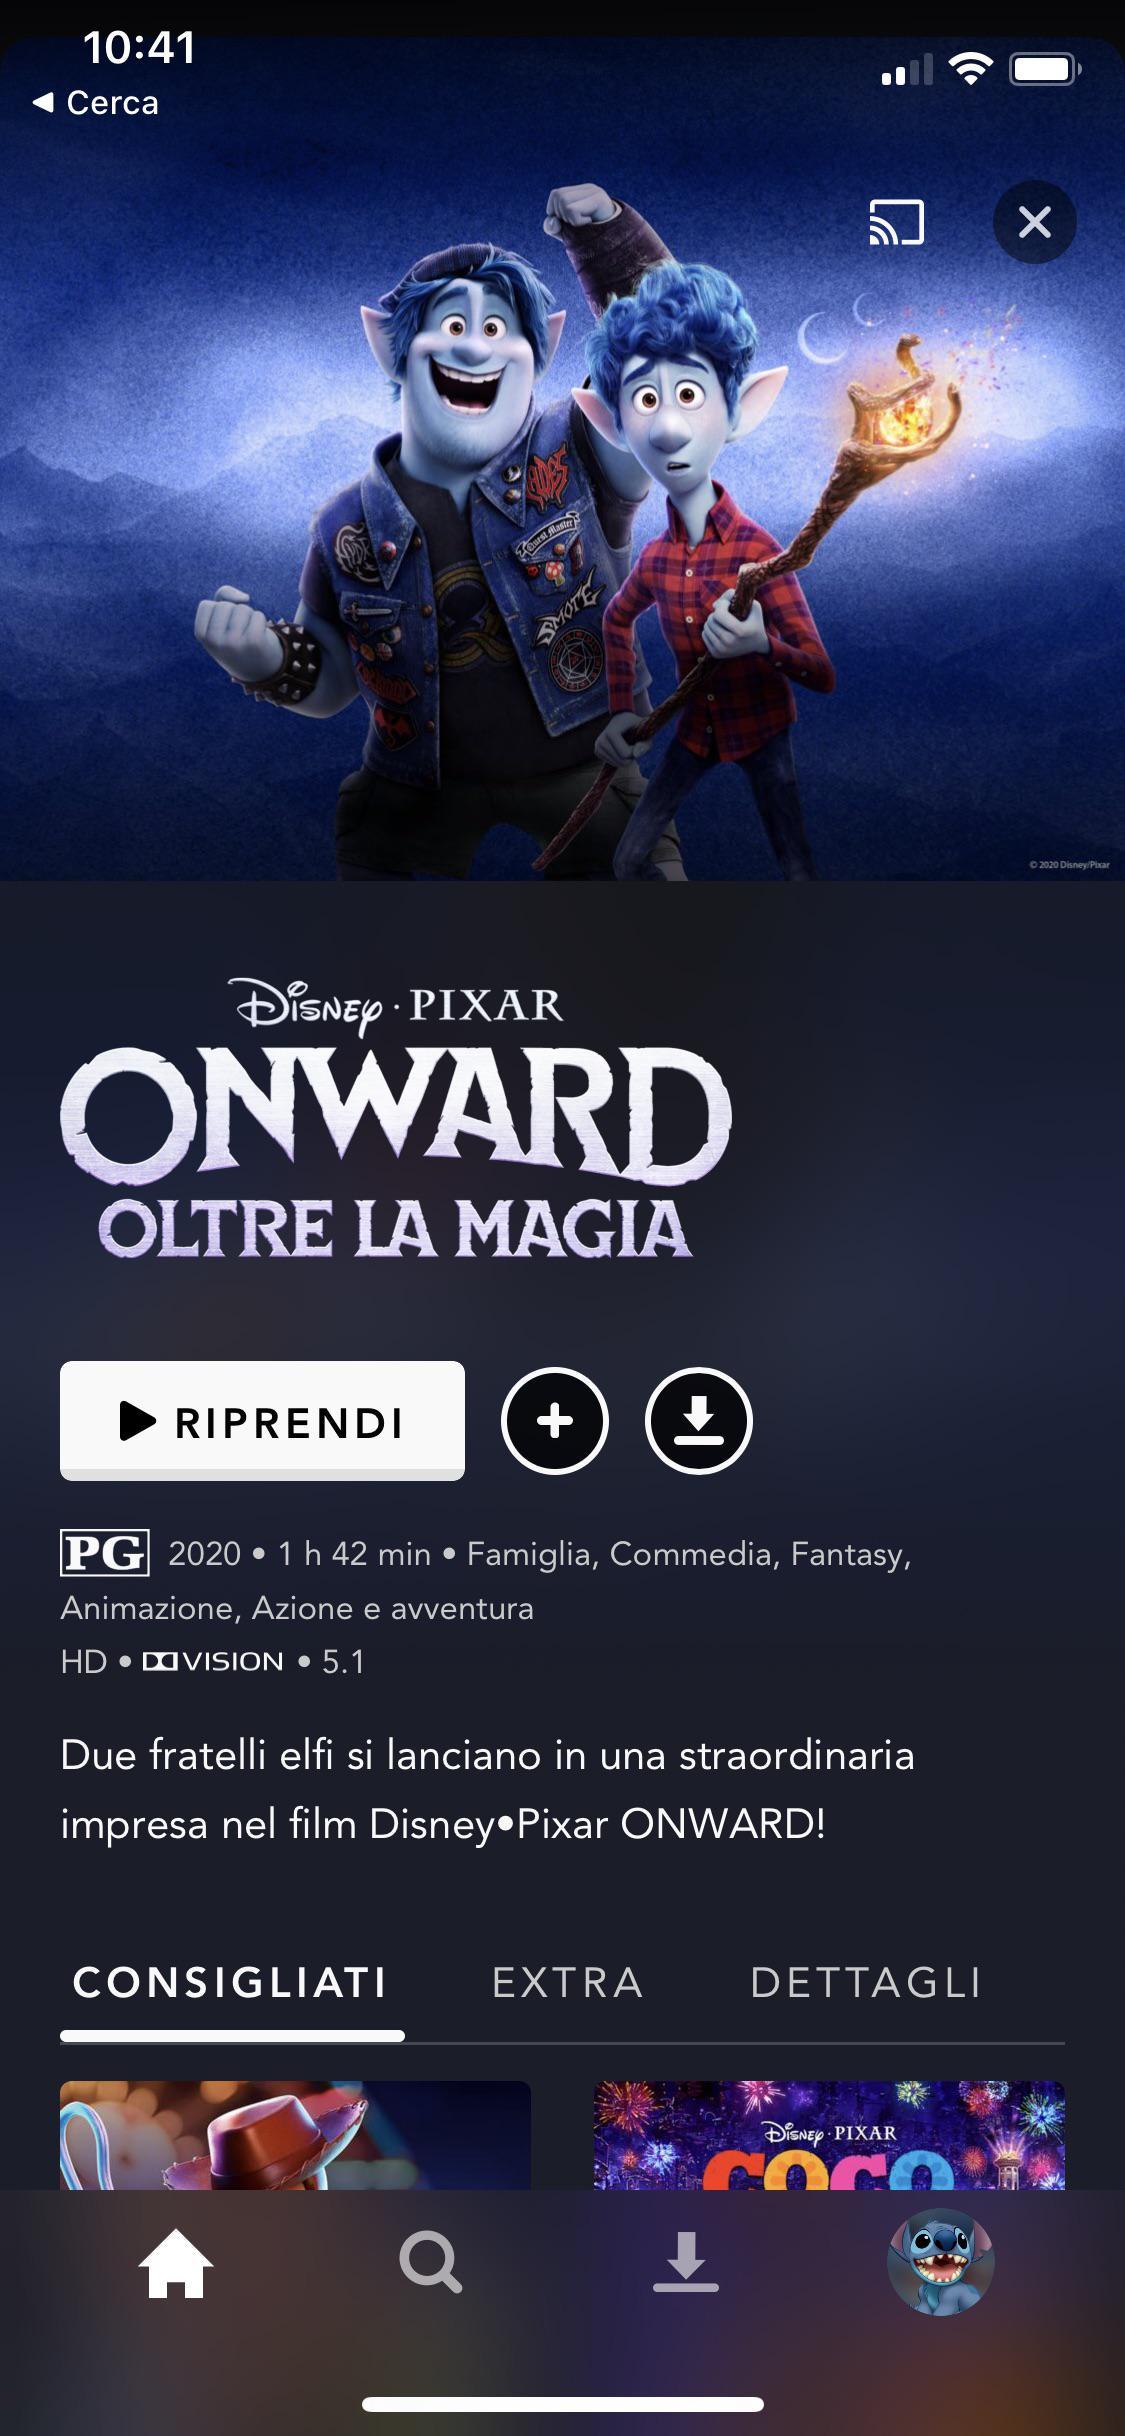 onward cover is translated in italian